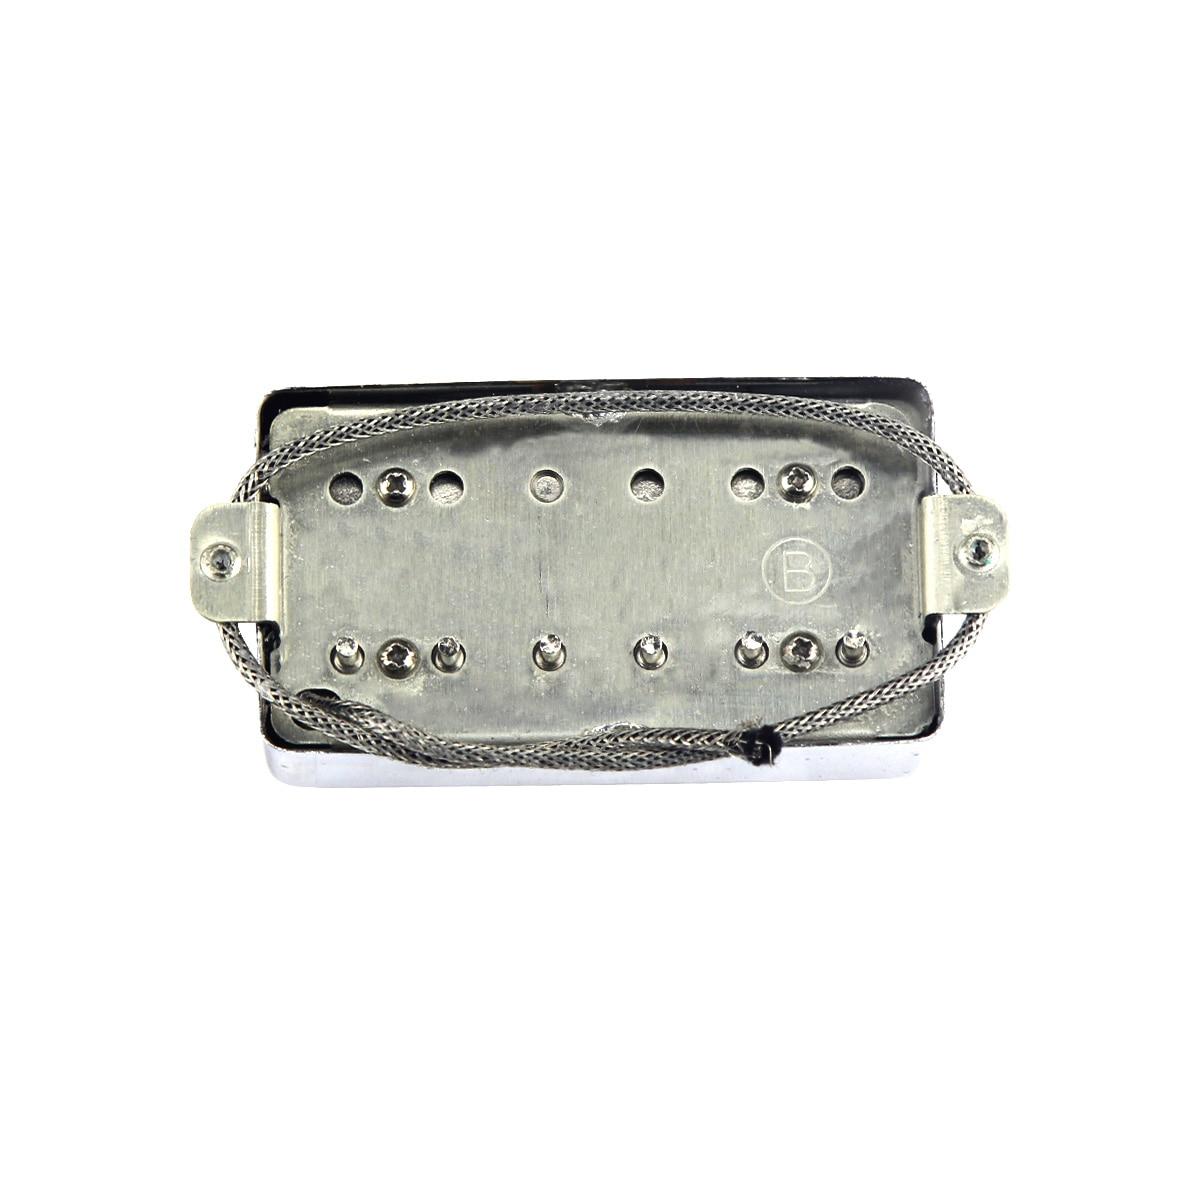 Image 5 - NEW Alnico 5 / V Humbucker Electric Guitar Pickup Chrome Neck or Bridge Pickup Choose For LP Style GuitarGuitar Parts & Accessories   -